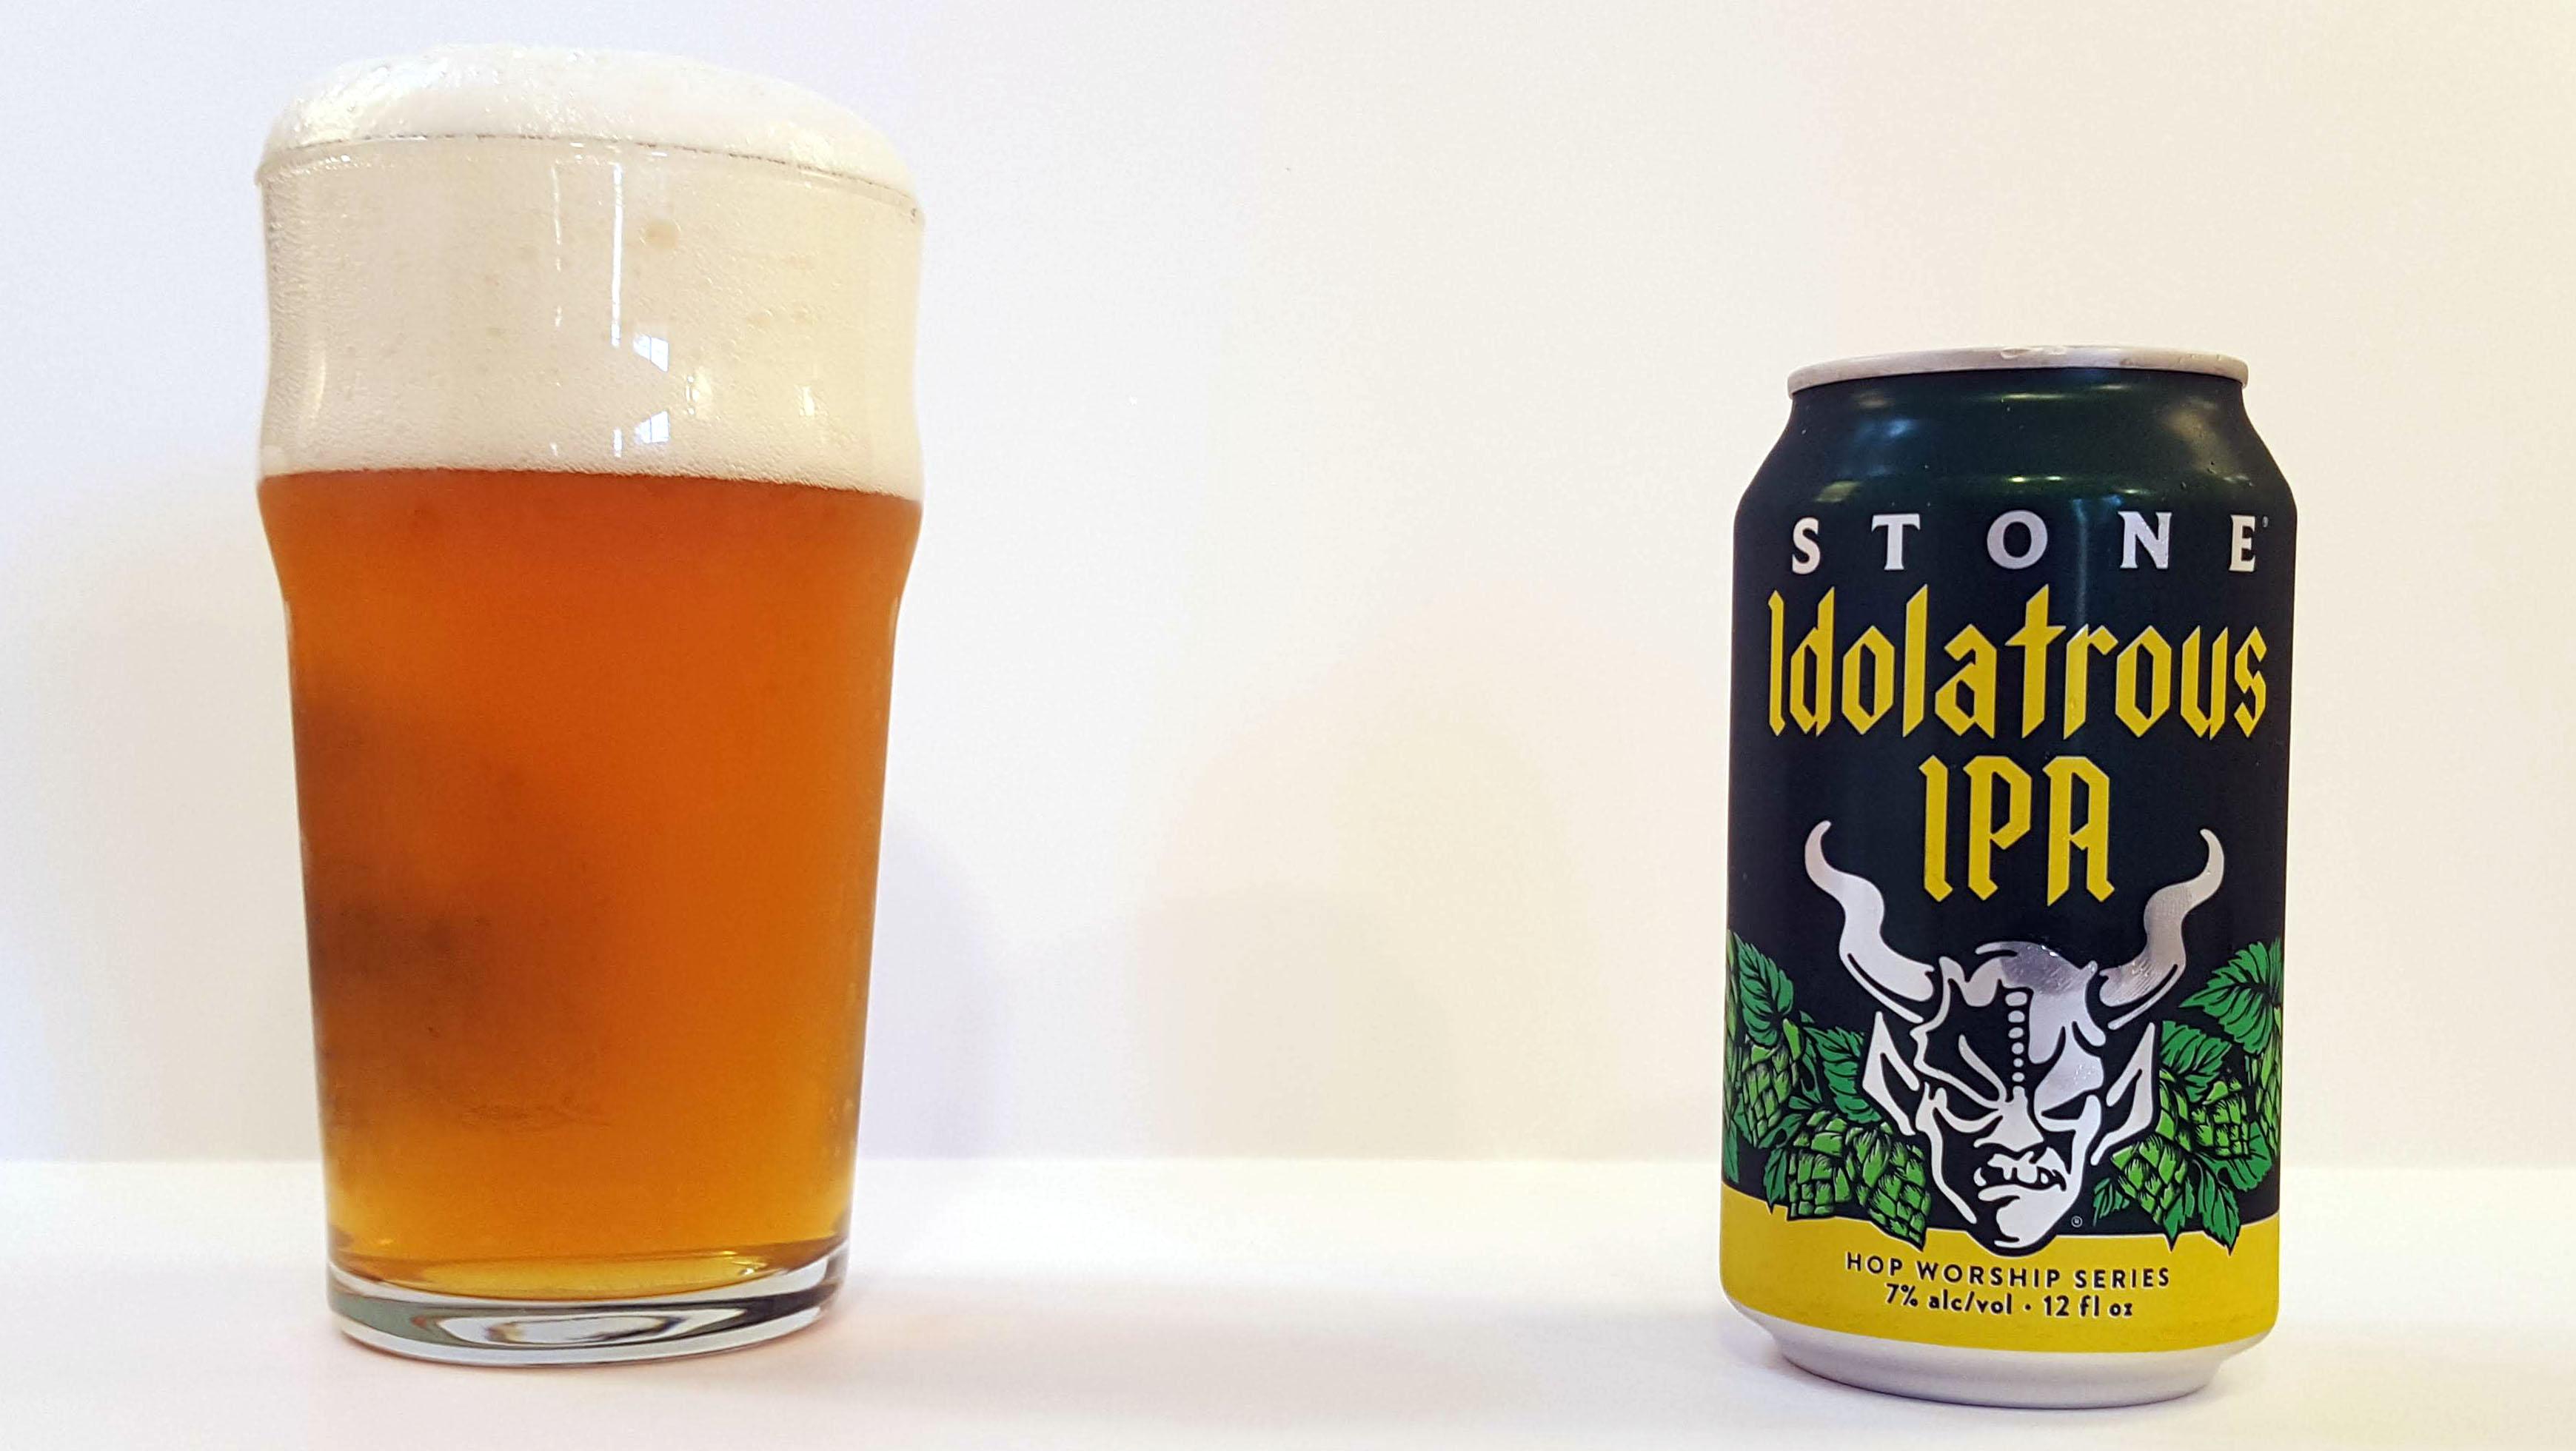 Stone Idolatrous IPA